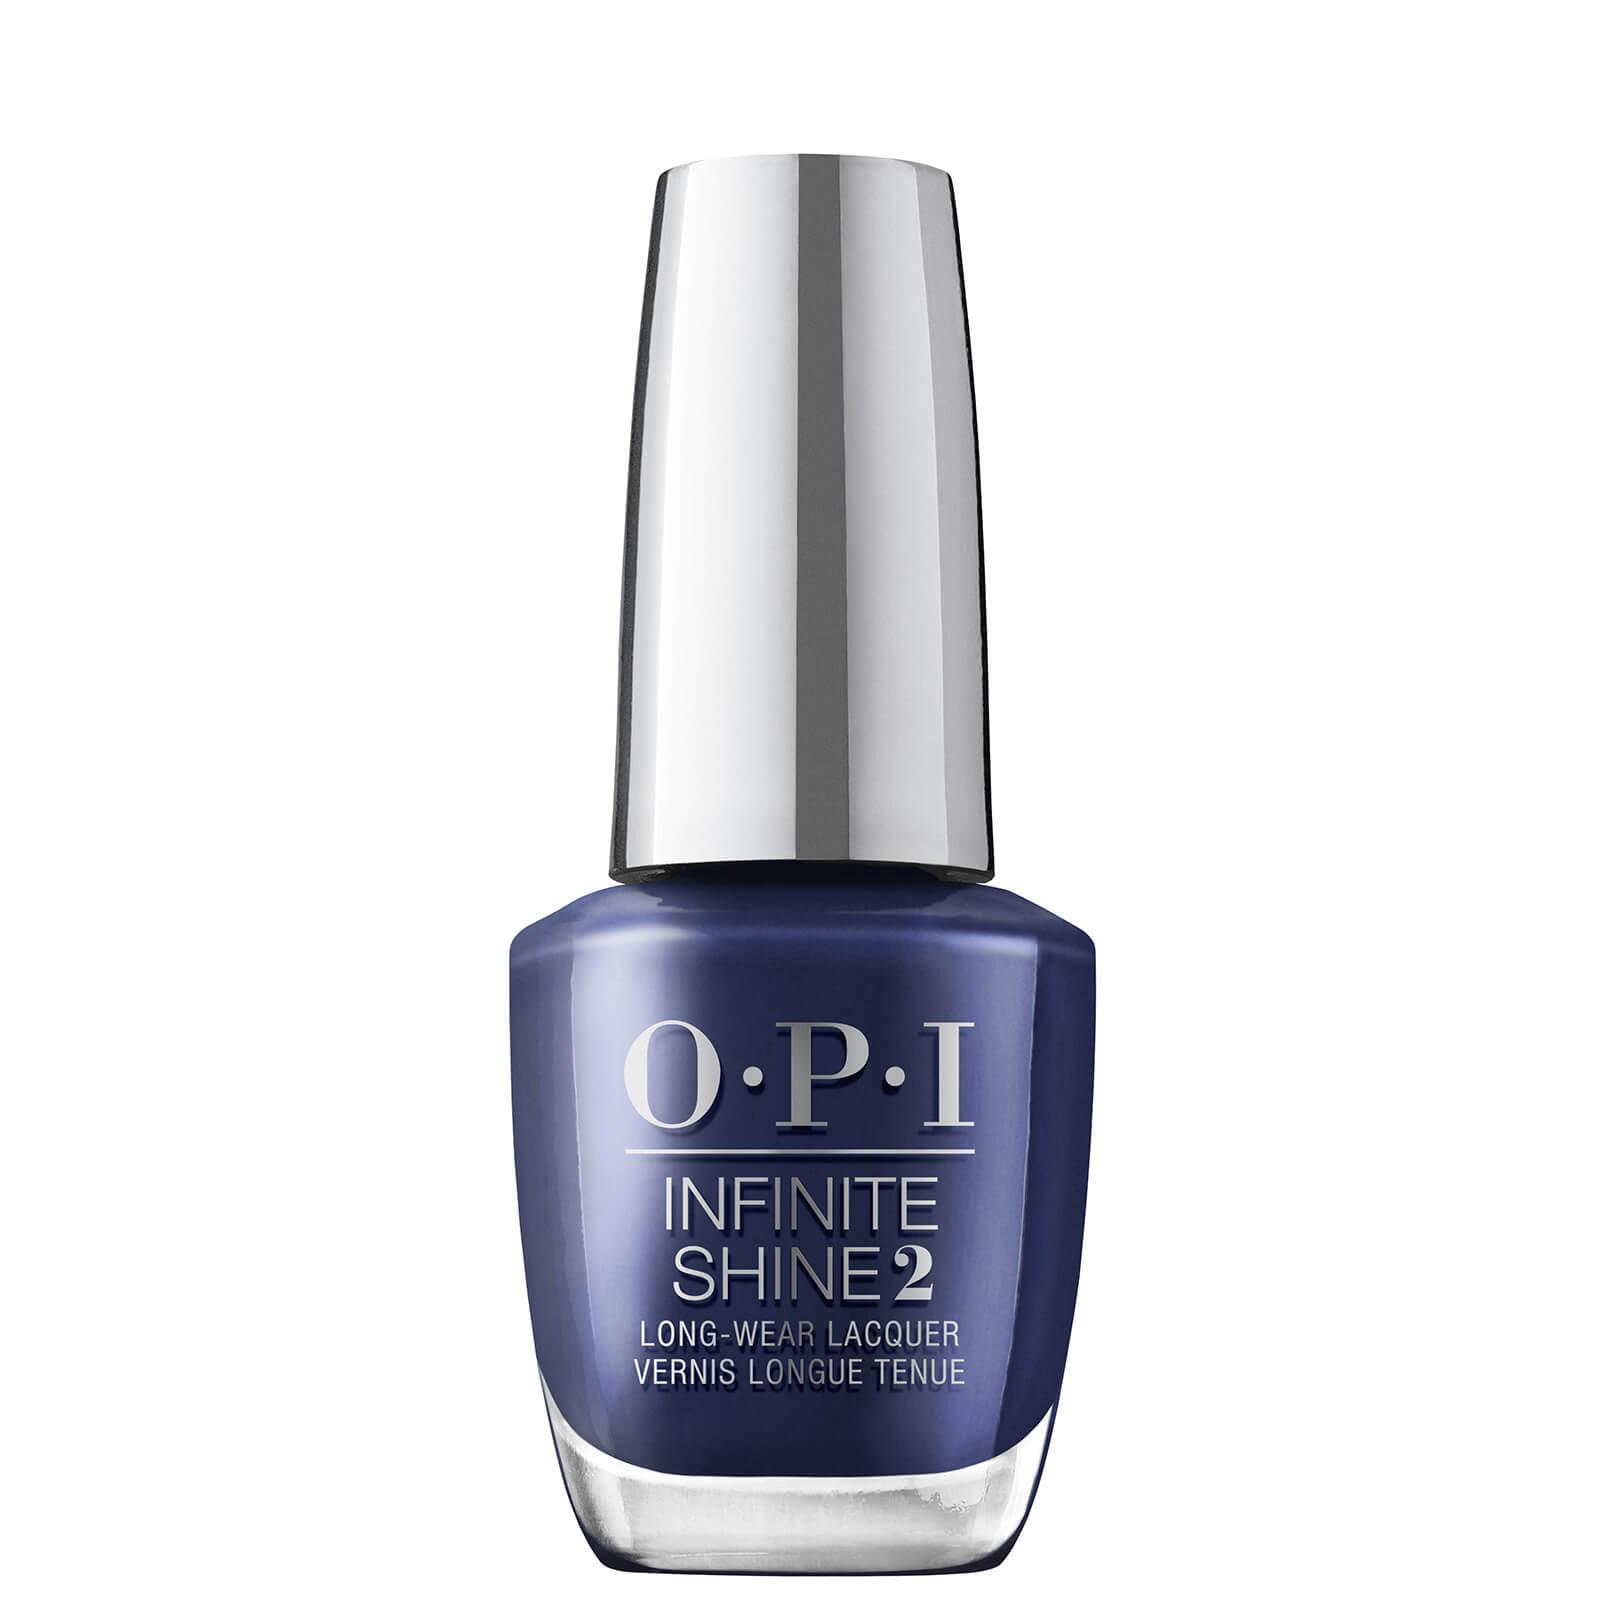 Купить OPI DTLA Collection Infinite Shine Long-wear Nail Polish 15ml (Various Shades) - Isn't it Grand Avenue